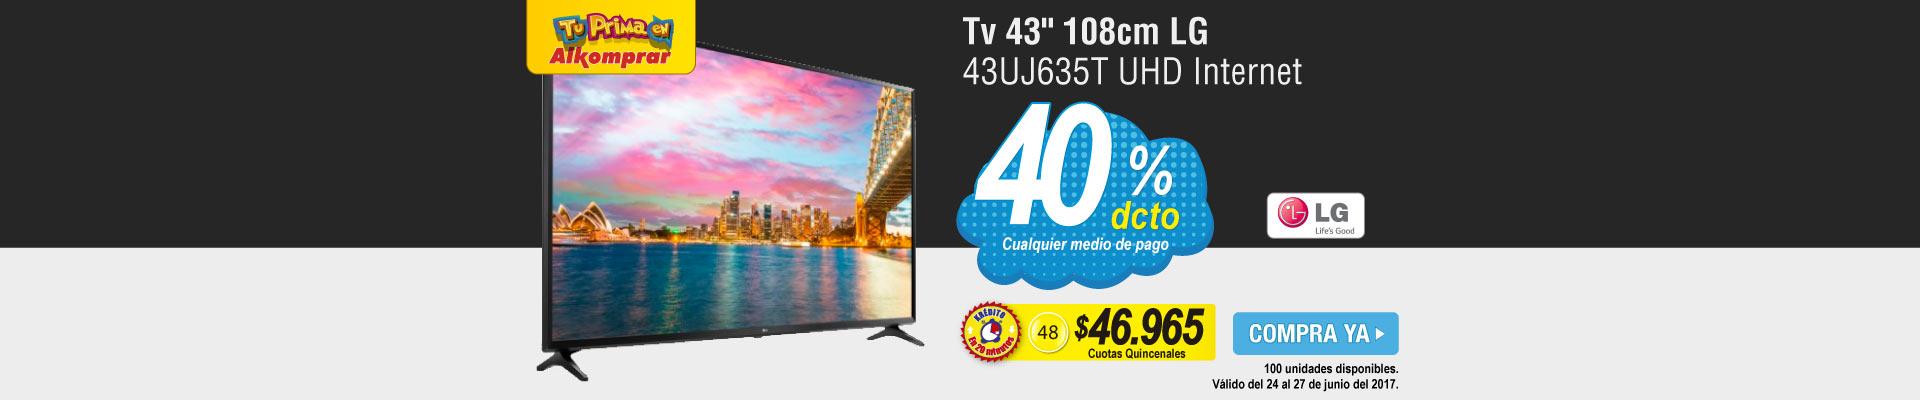 Tv 43 108cm LG 43UJ635T UHD Internet - banner principal